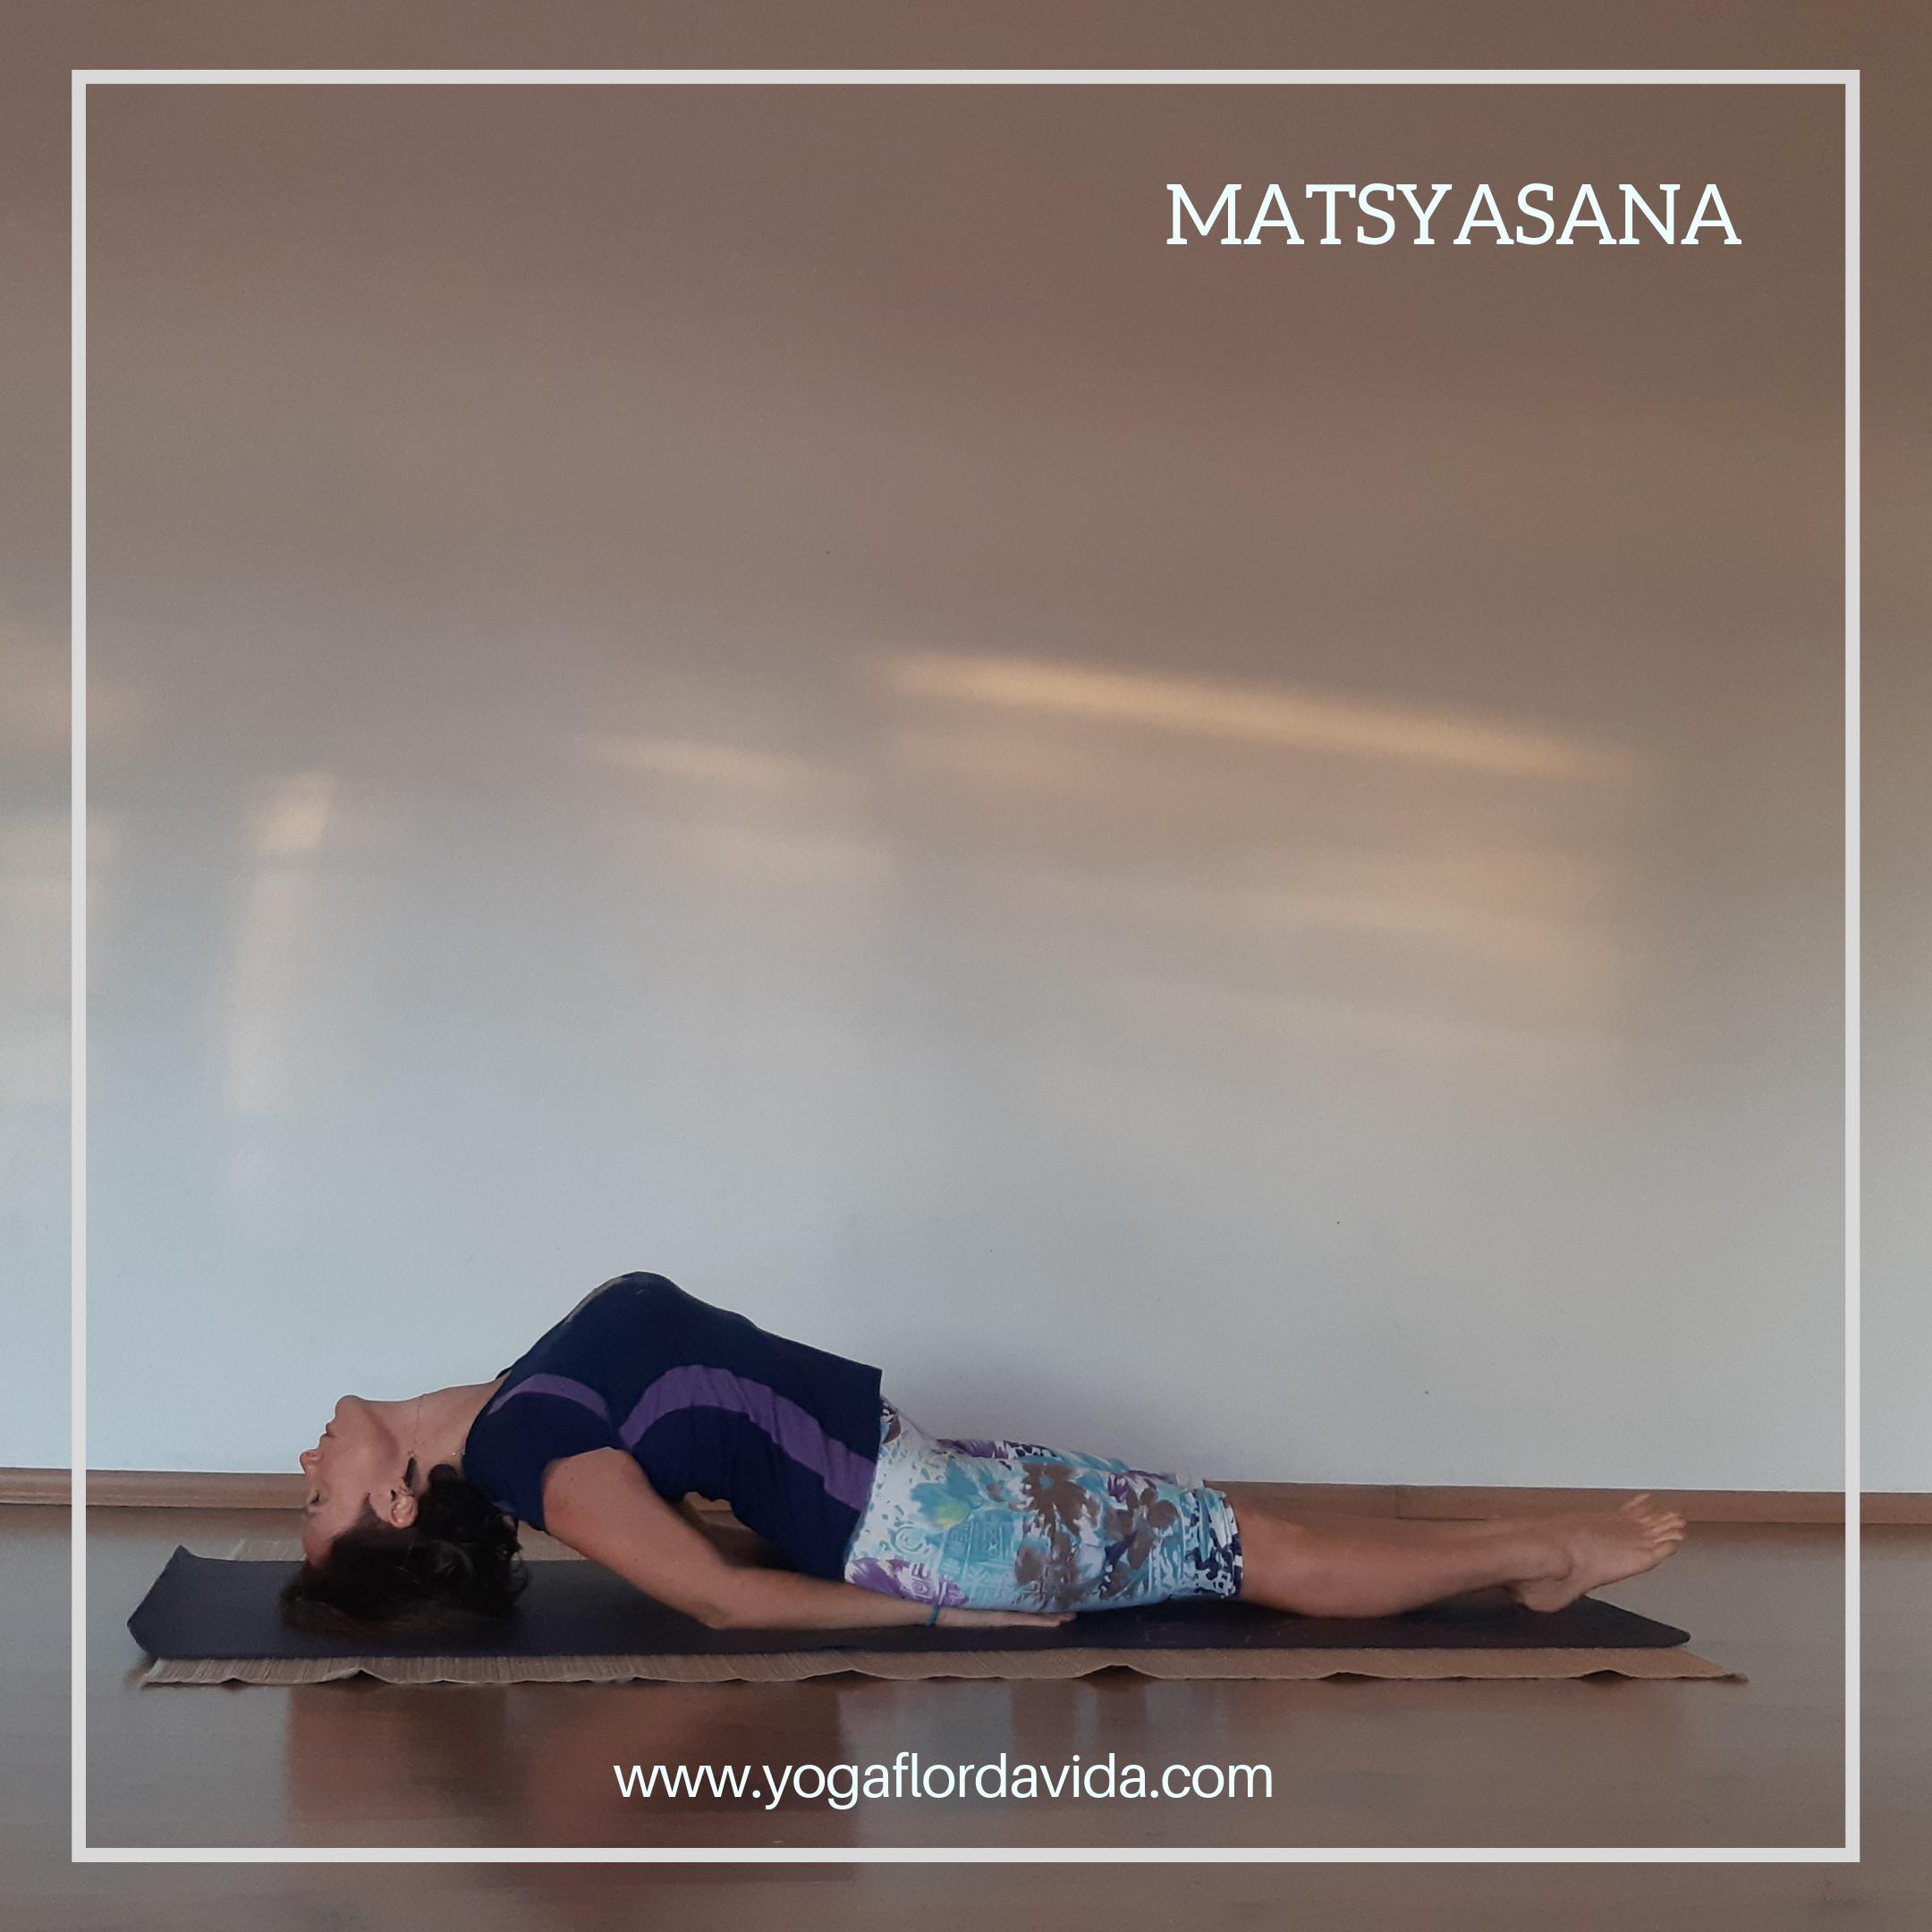 www.yogaflordavida.com (6).png